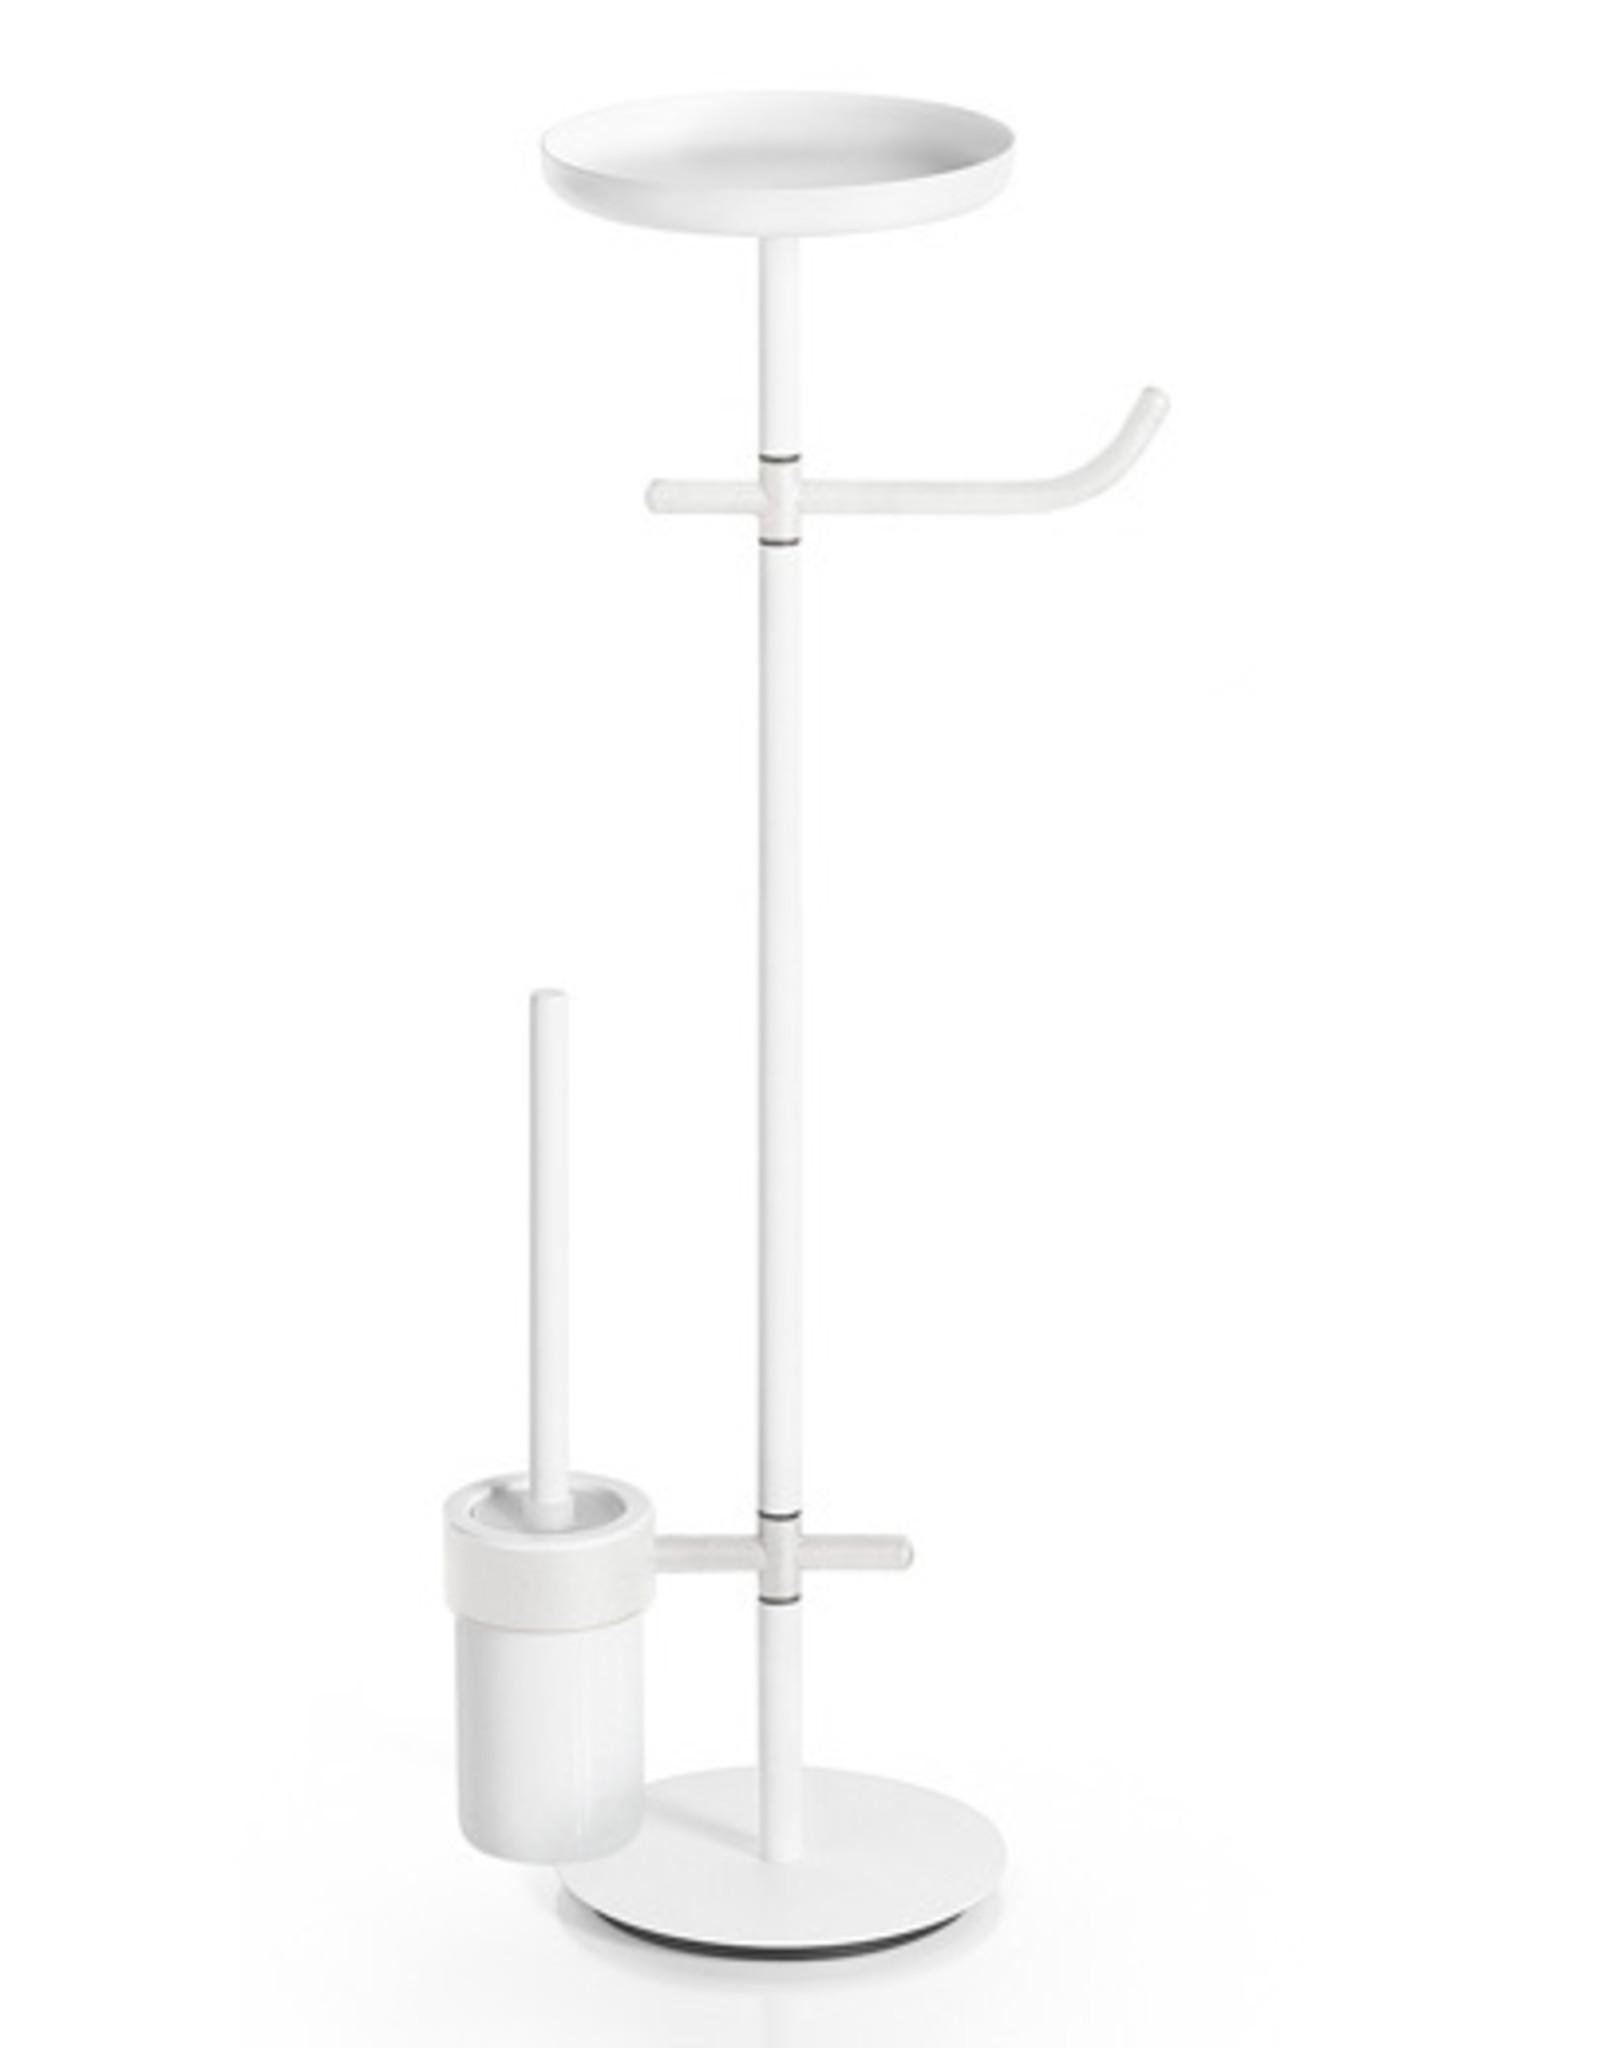 Ranpin toiletset op standaard, rond, wit - uitverkoop